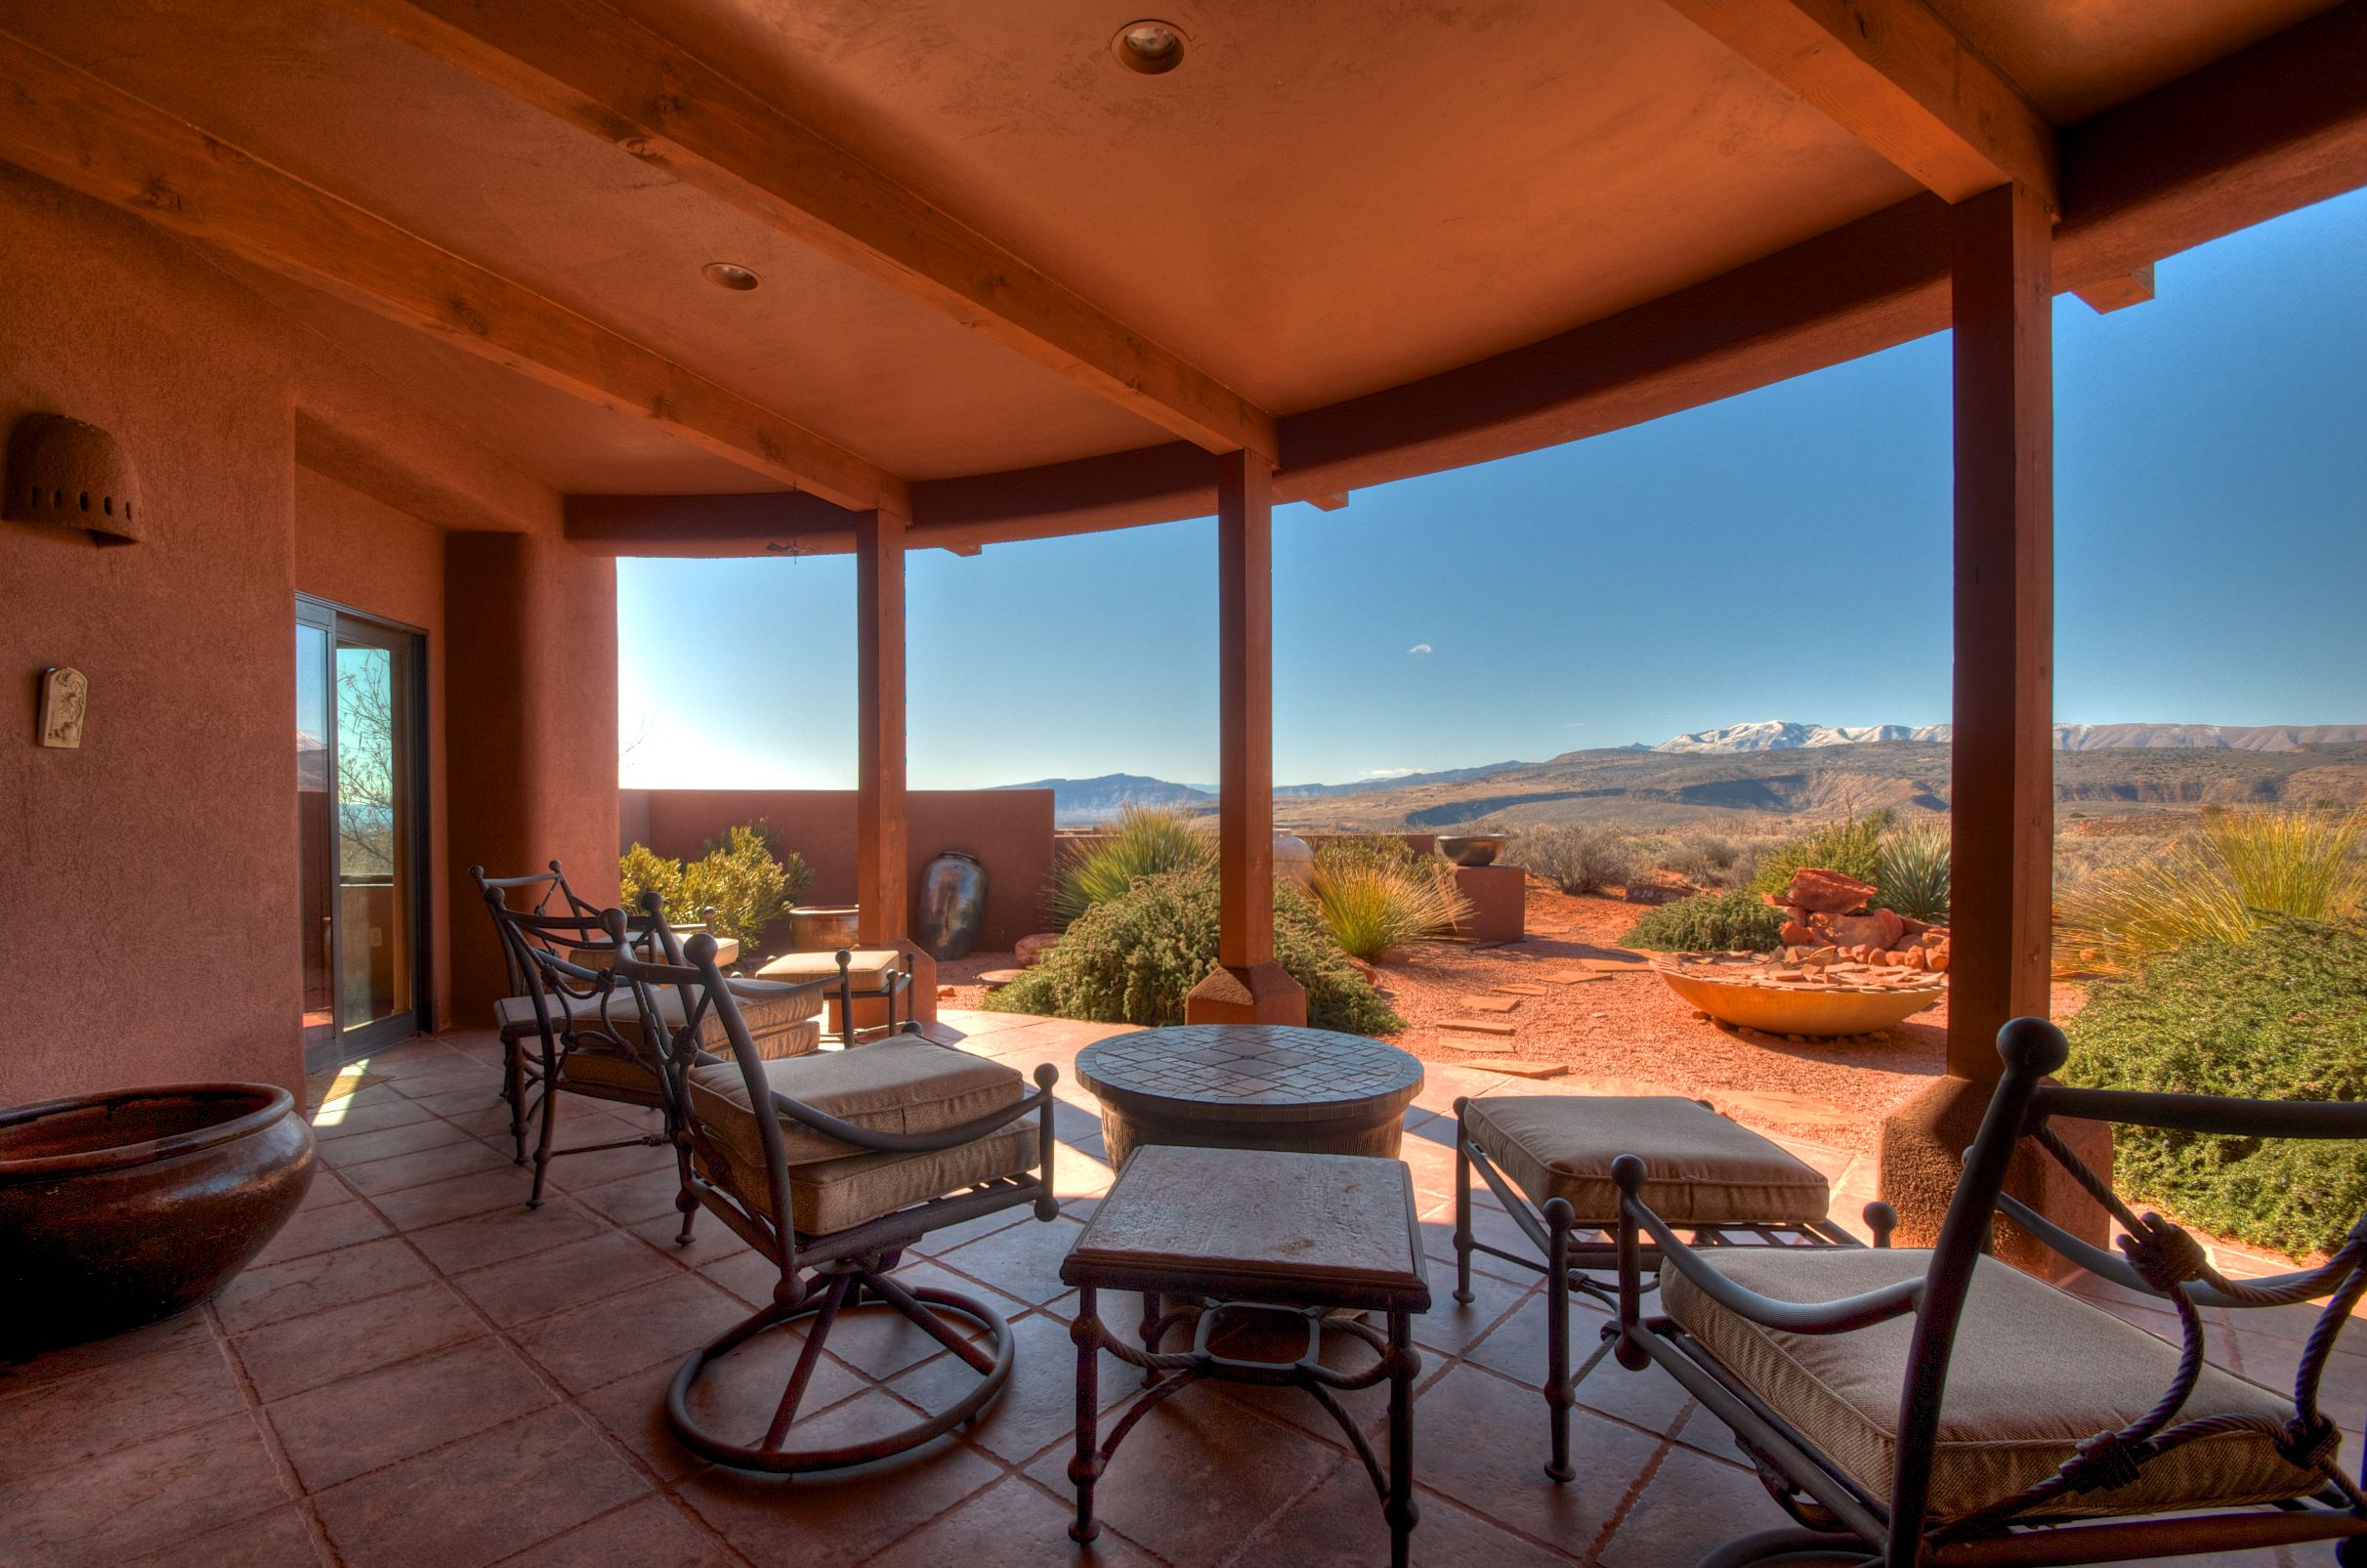 Views From Covered Patio Of Kayenta Utah Home